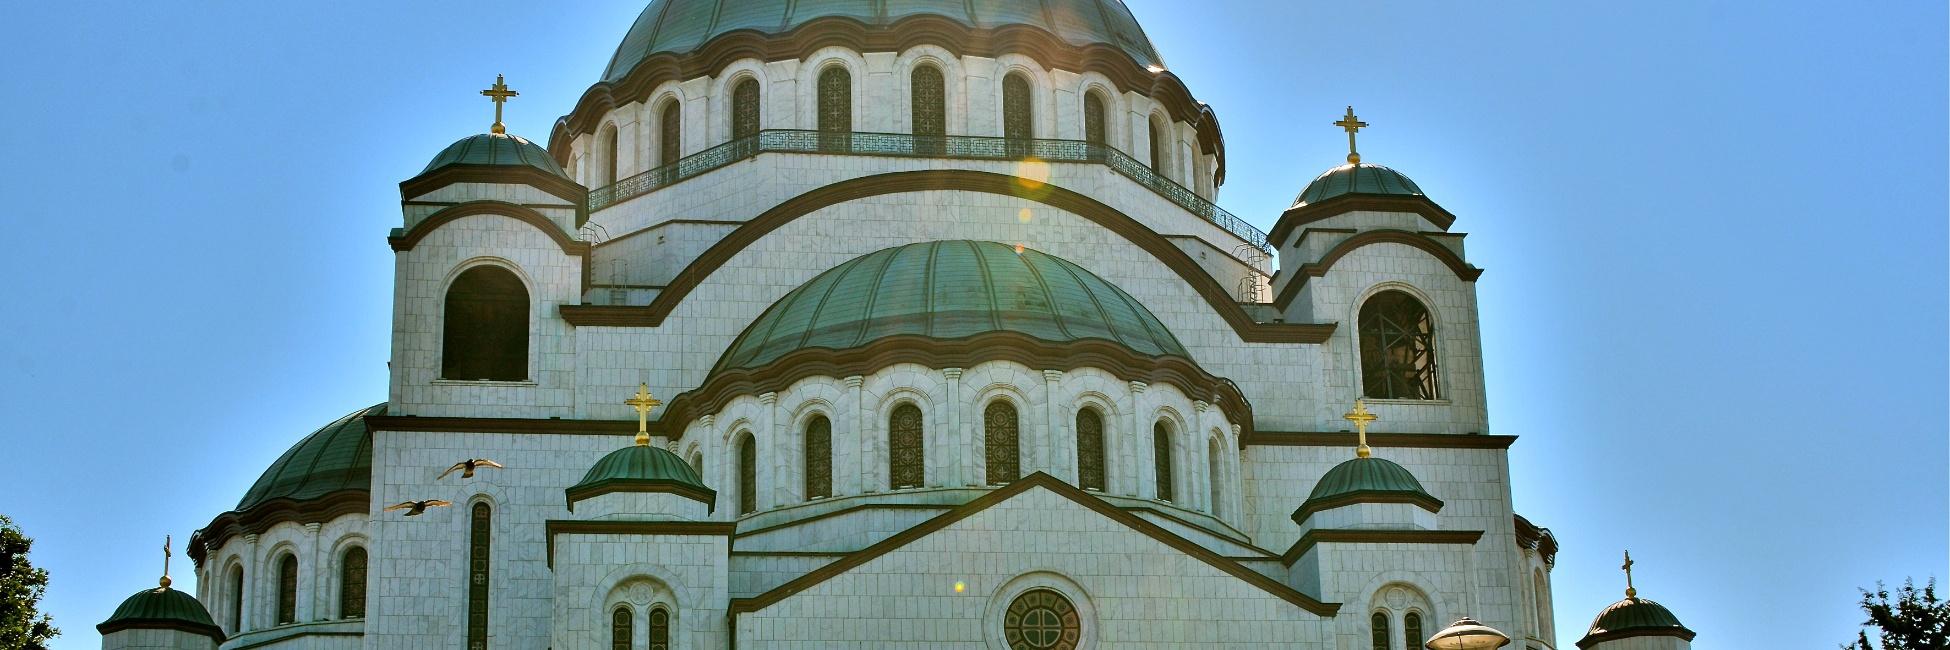 Eglise saint-sava à Belgrade